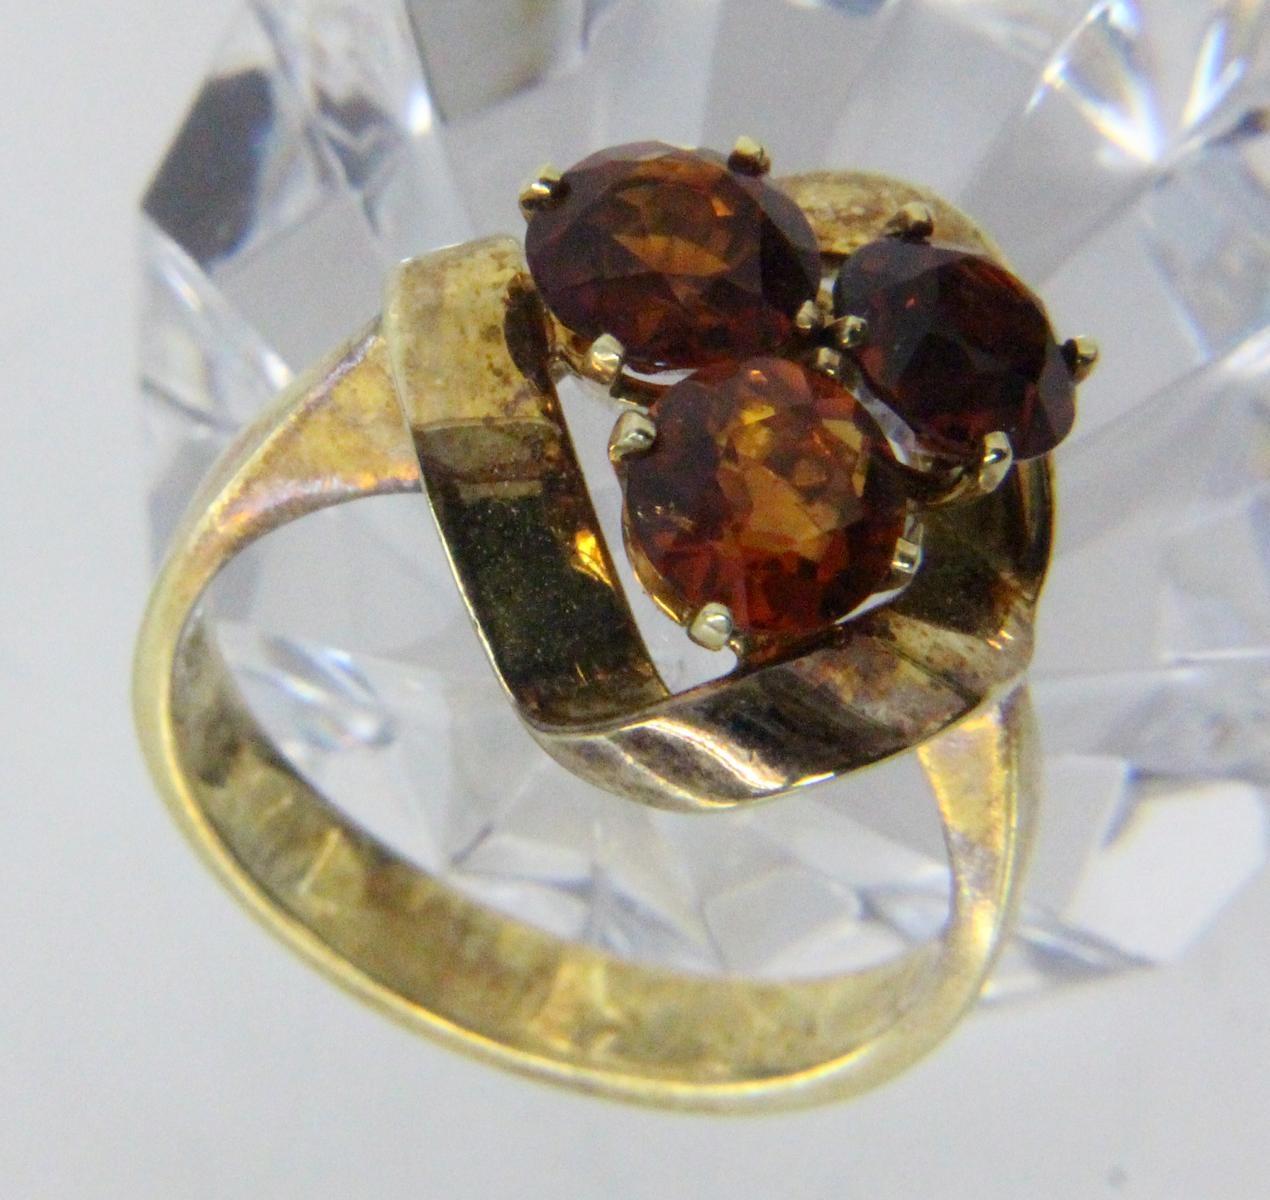 DAMENRING585/000 Gelbgold mit 3 Madeiracitrinen. Ringgr. 57, Brutto ca. 6,6gA LADIES RING 585/000